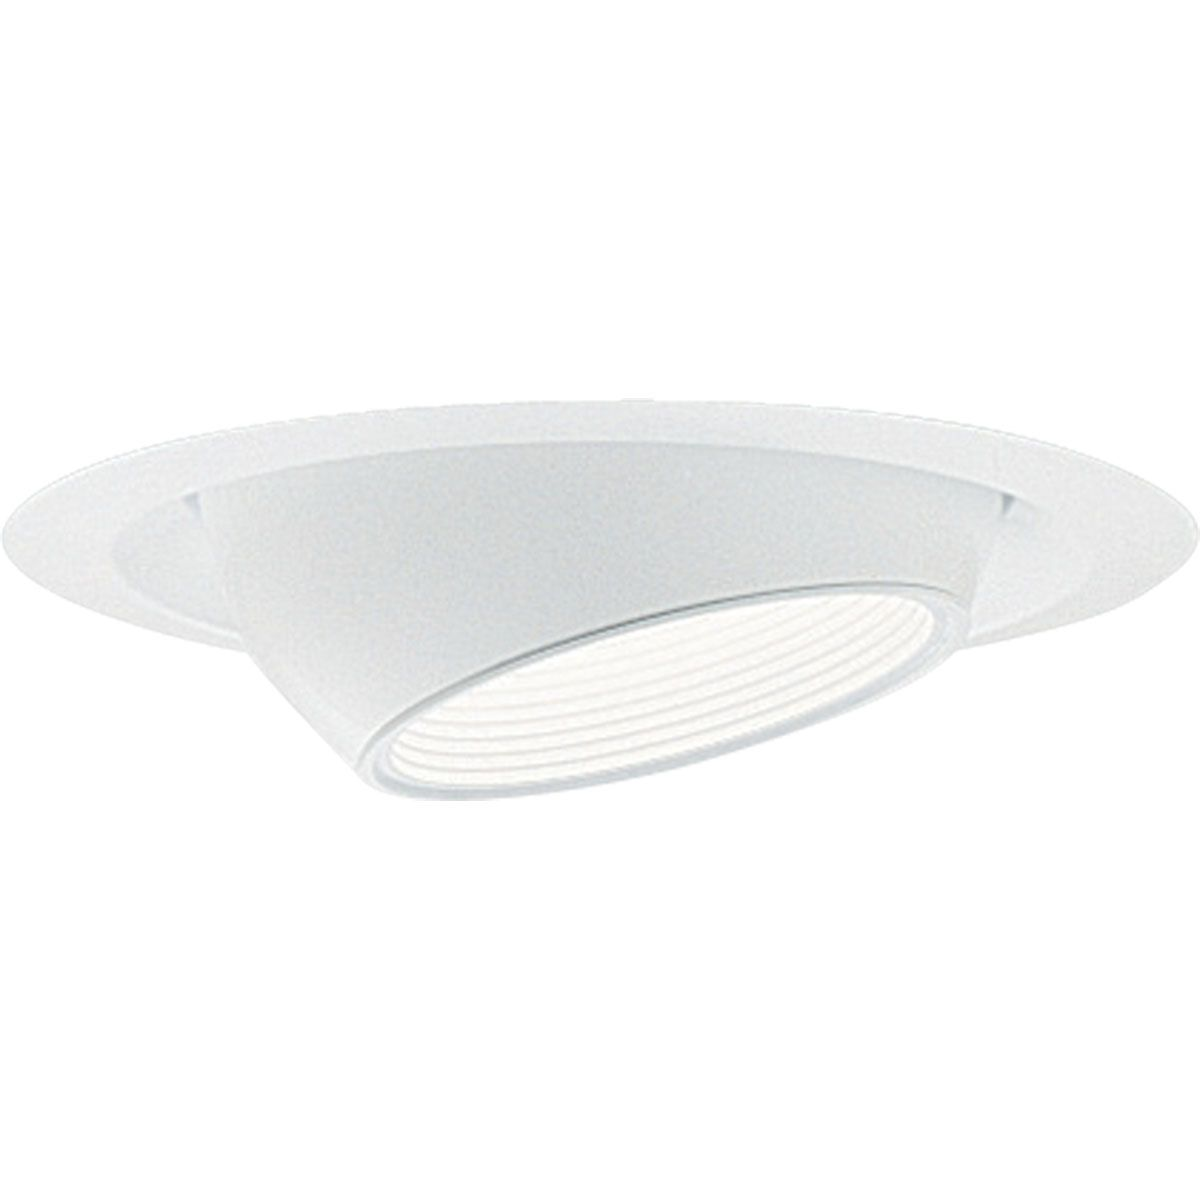 PROP8077-28 MINI EYEBALL WITH BAFFLE; WHITE; 6 INCH NOMINAL APERTURE SIZE; ROUND APERTURE SHAPE; R20/PAR20/PAR16 75 W INCANDESCENT LAMP; PAR20/PAR16/R20 75 W FLUORESCENT LAMP; INSULATED/NON INSULATED CEILING; SIZE 7 3/4 INCH DIA; PROGRESS LIGHTING[R] BRAND, PROGRESS